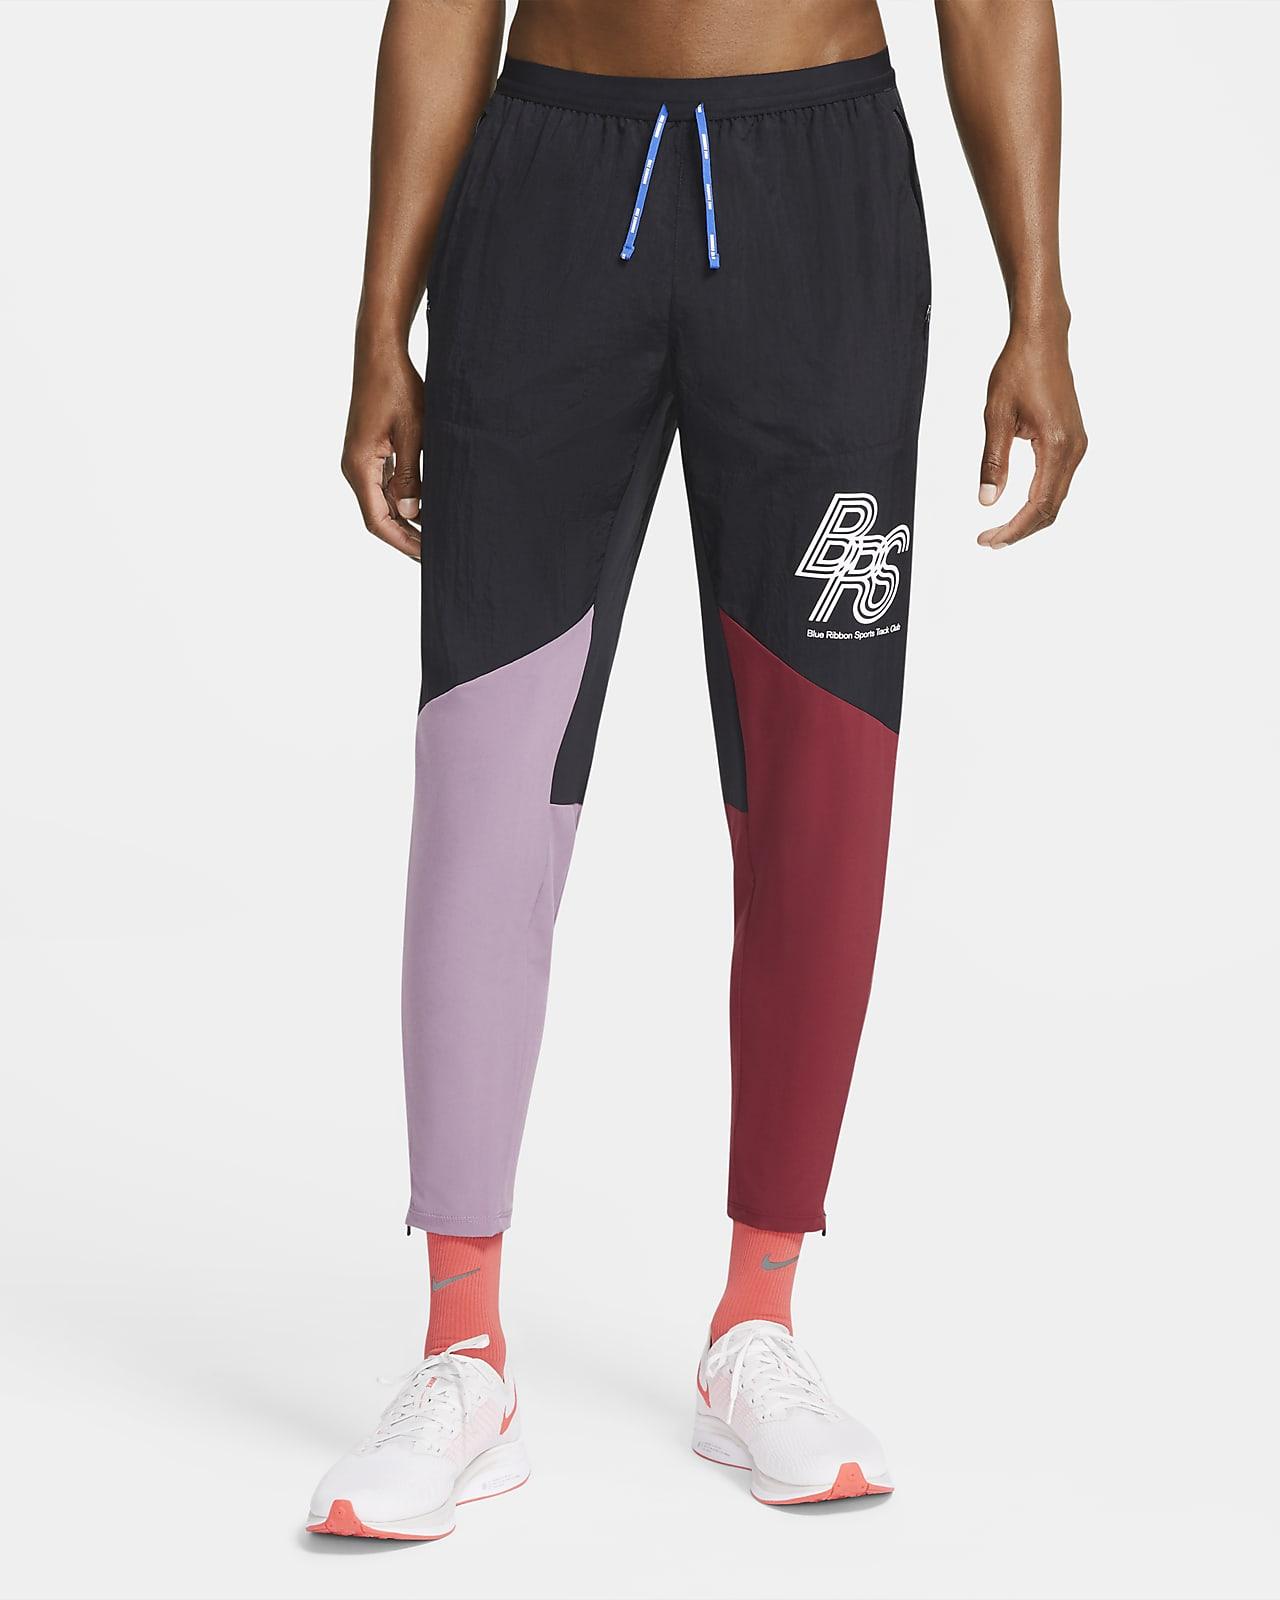 Pánské tkané běžecké kalhoty Nike Phenom Elite BRS